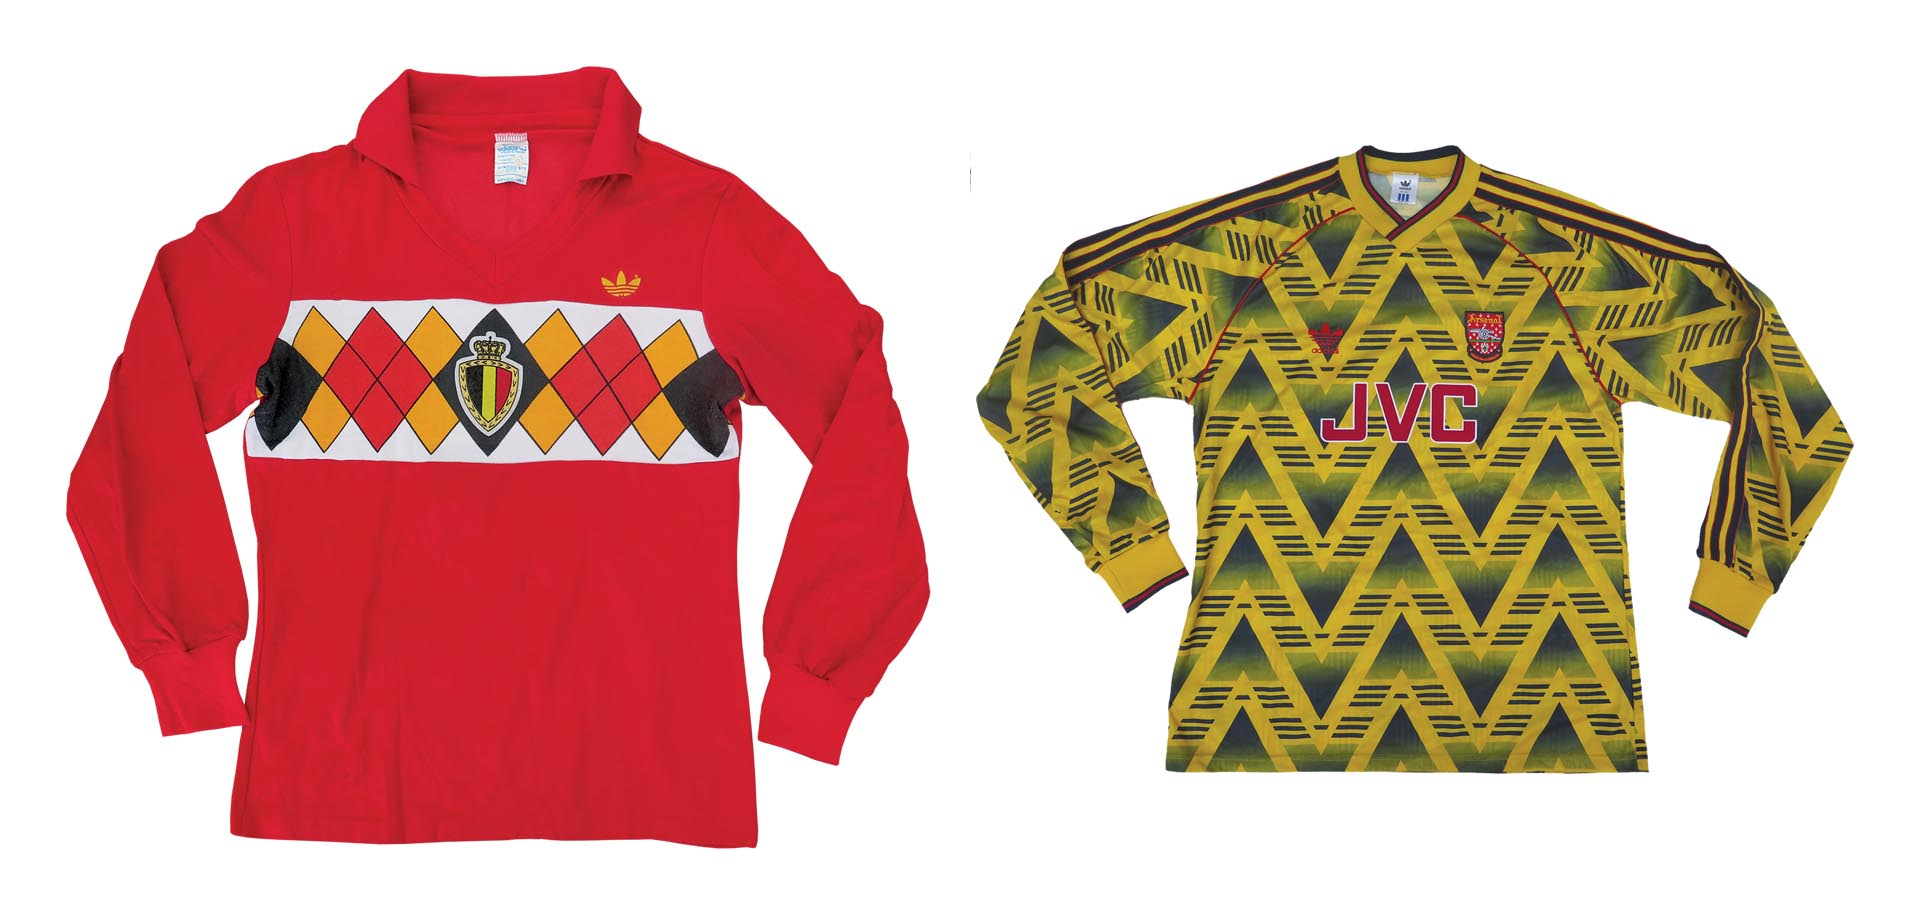 neal-heard-jacket-required-art-of-the-football-shirt_0007_belgium-84-1